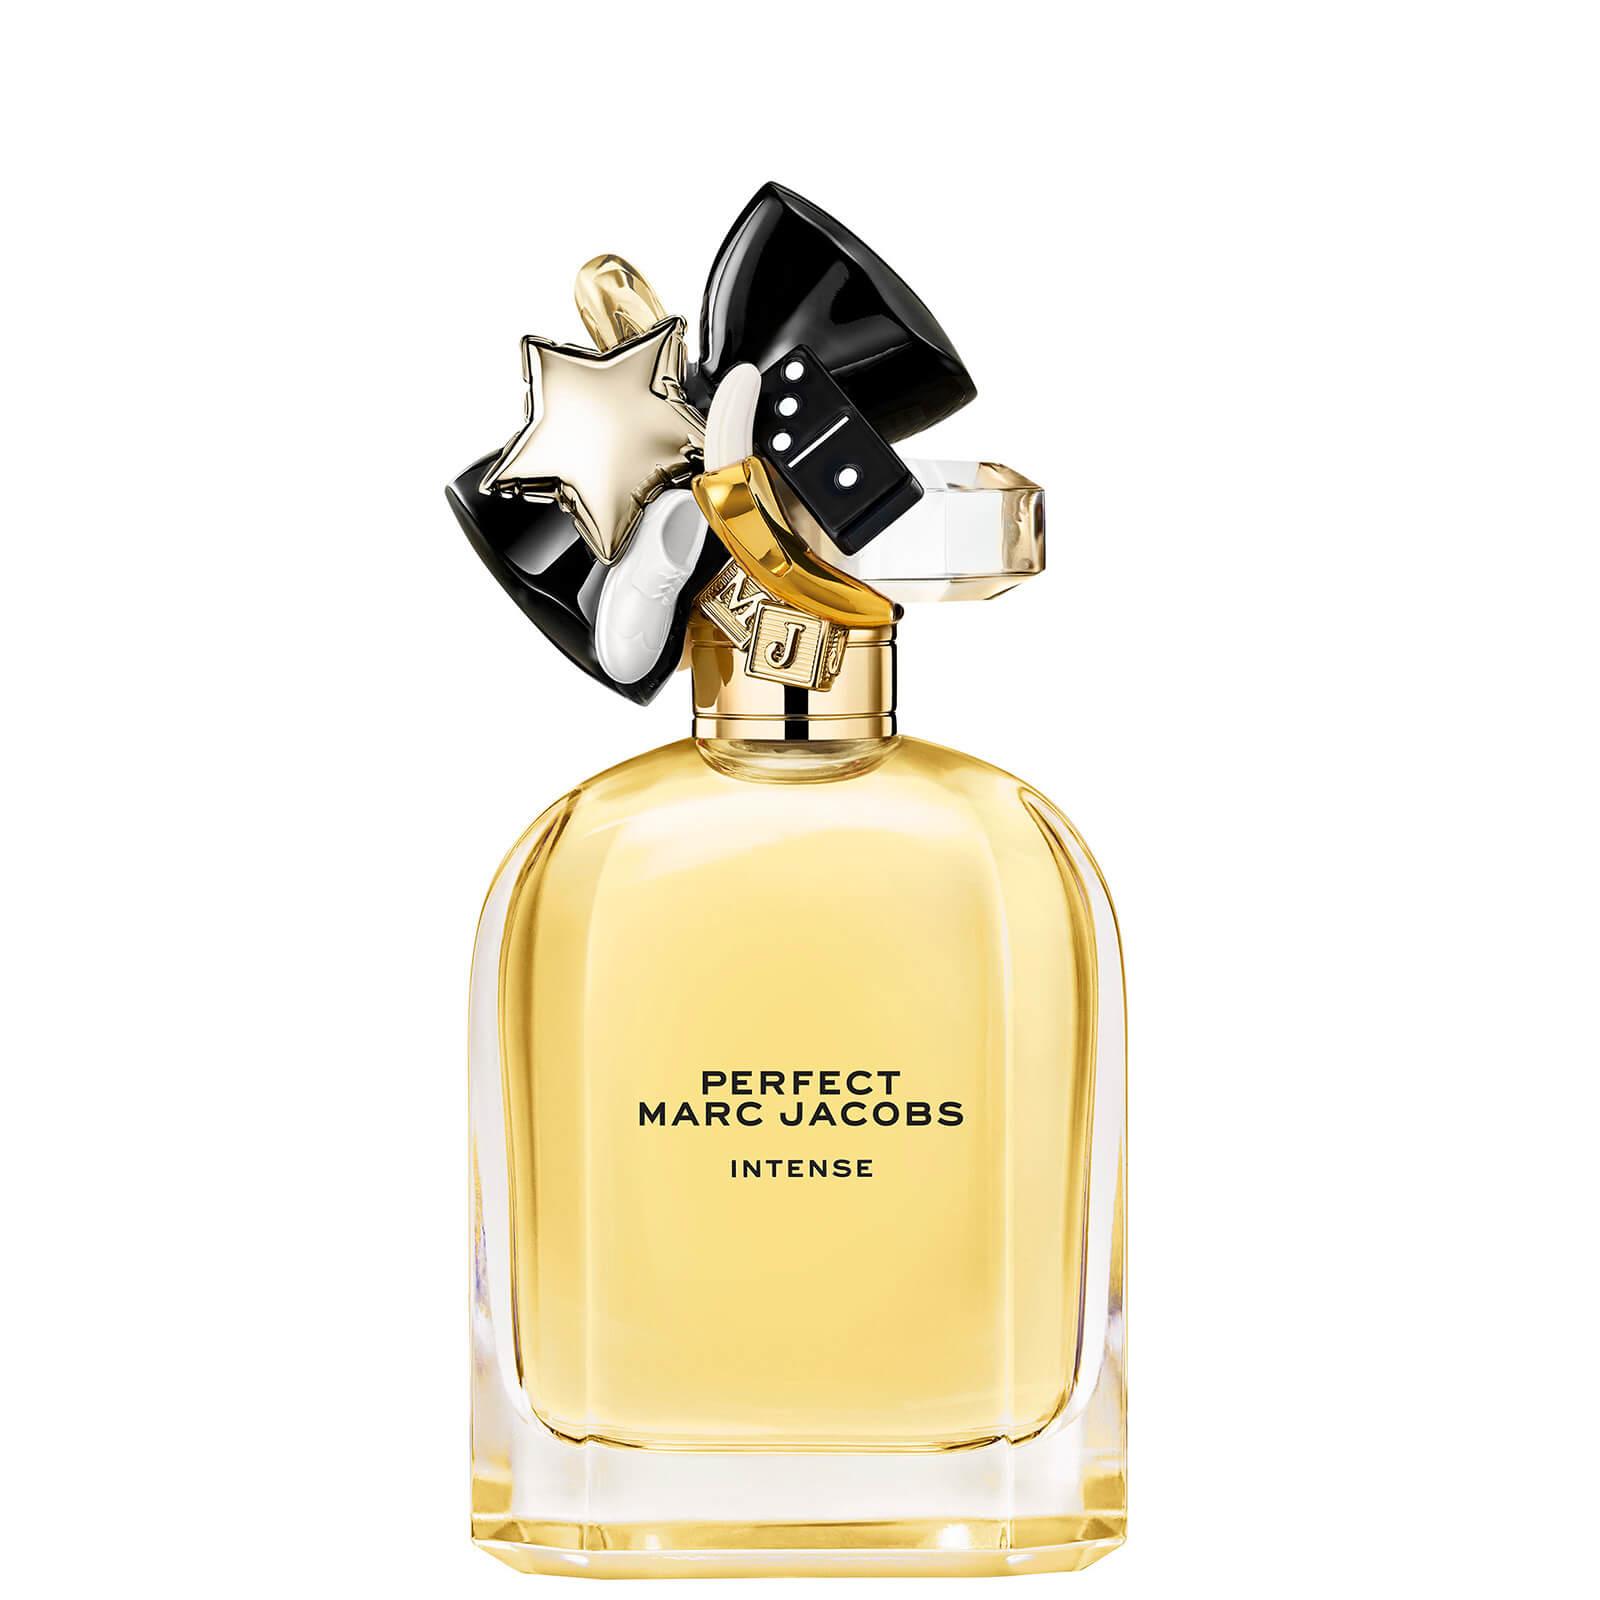 Купить Marc Jacobs Perfect Intense Eau de Parfum 100ml